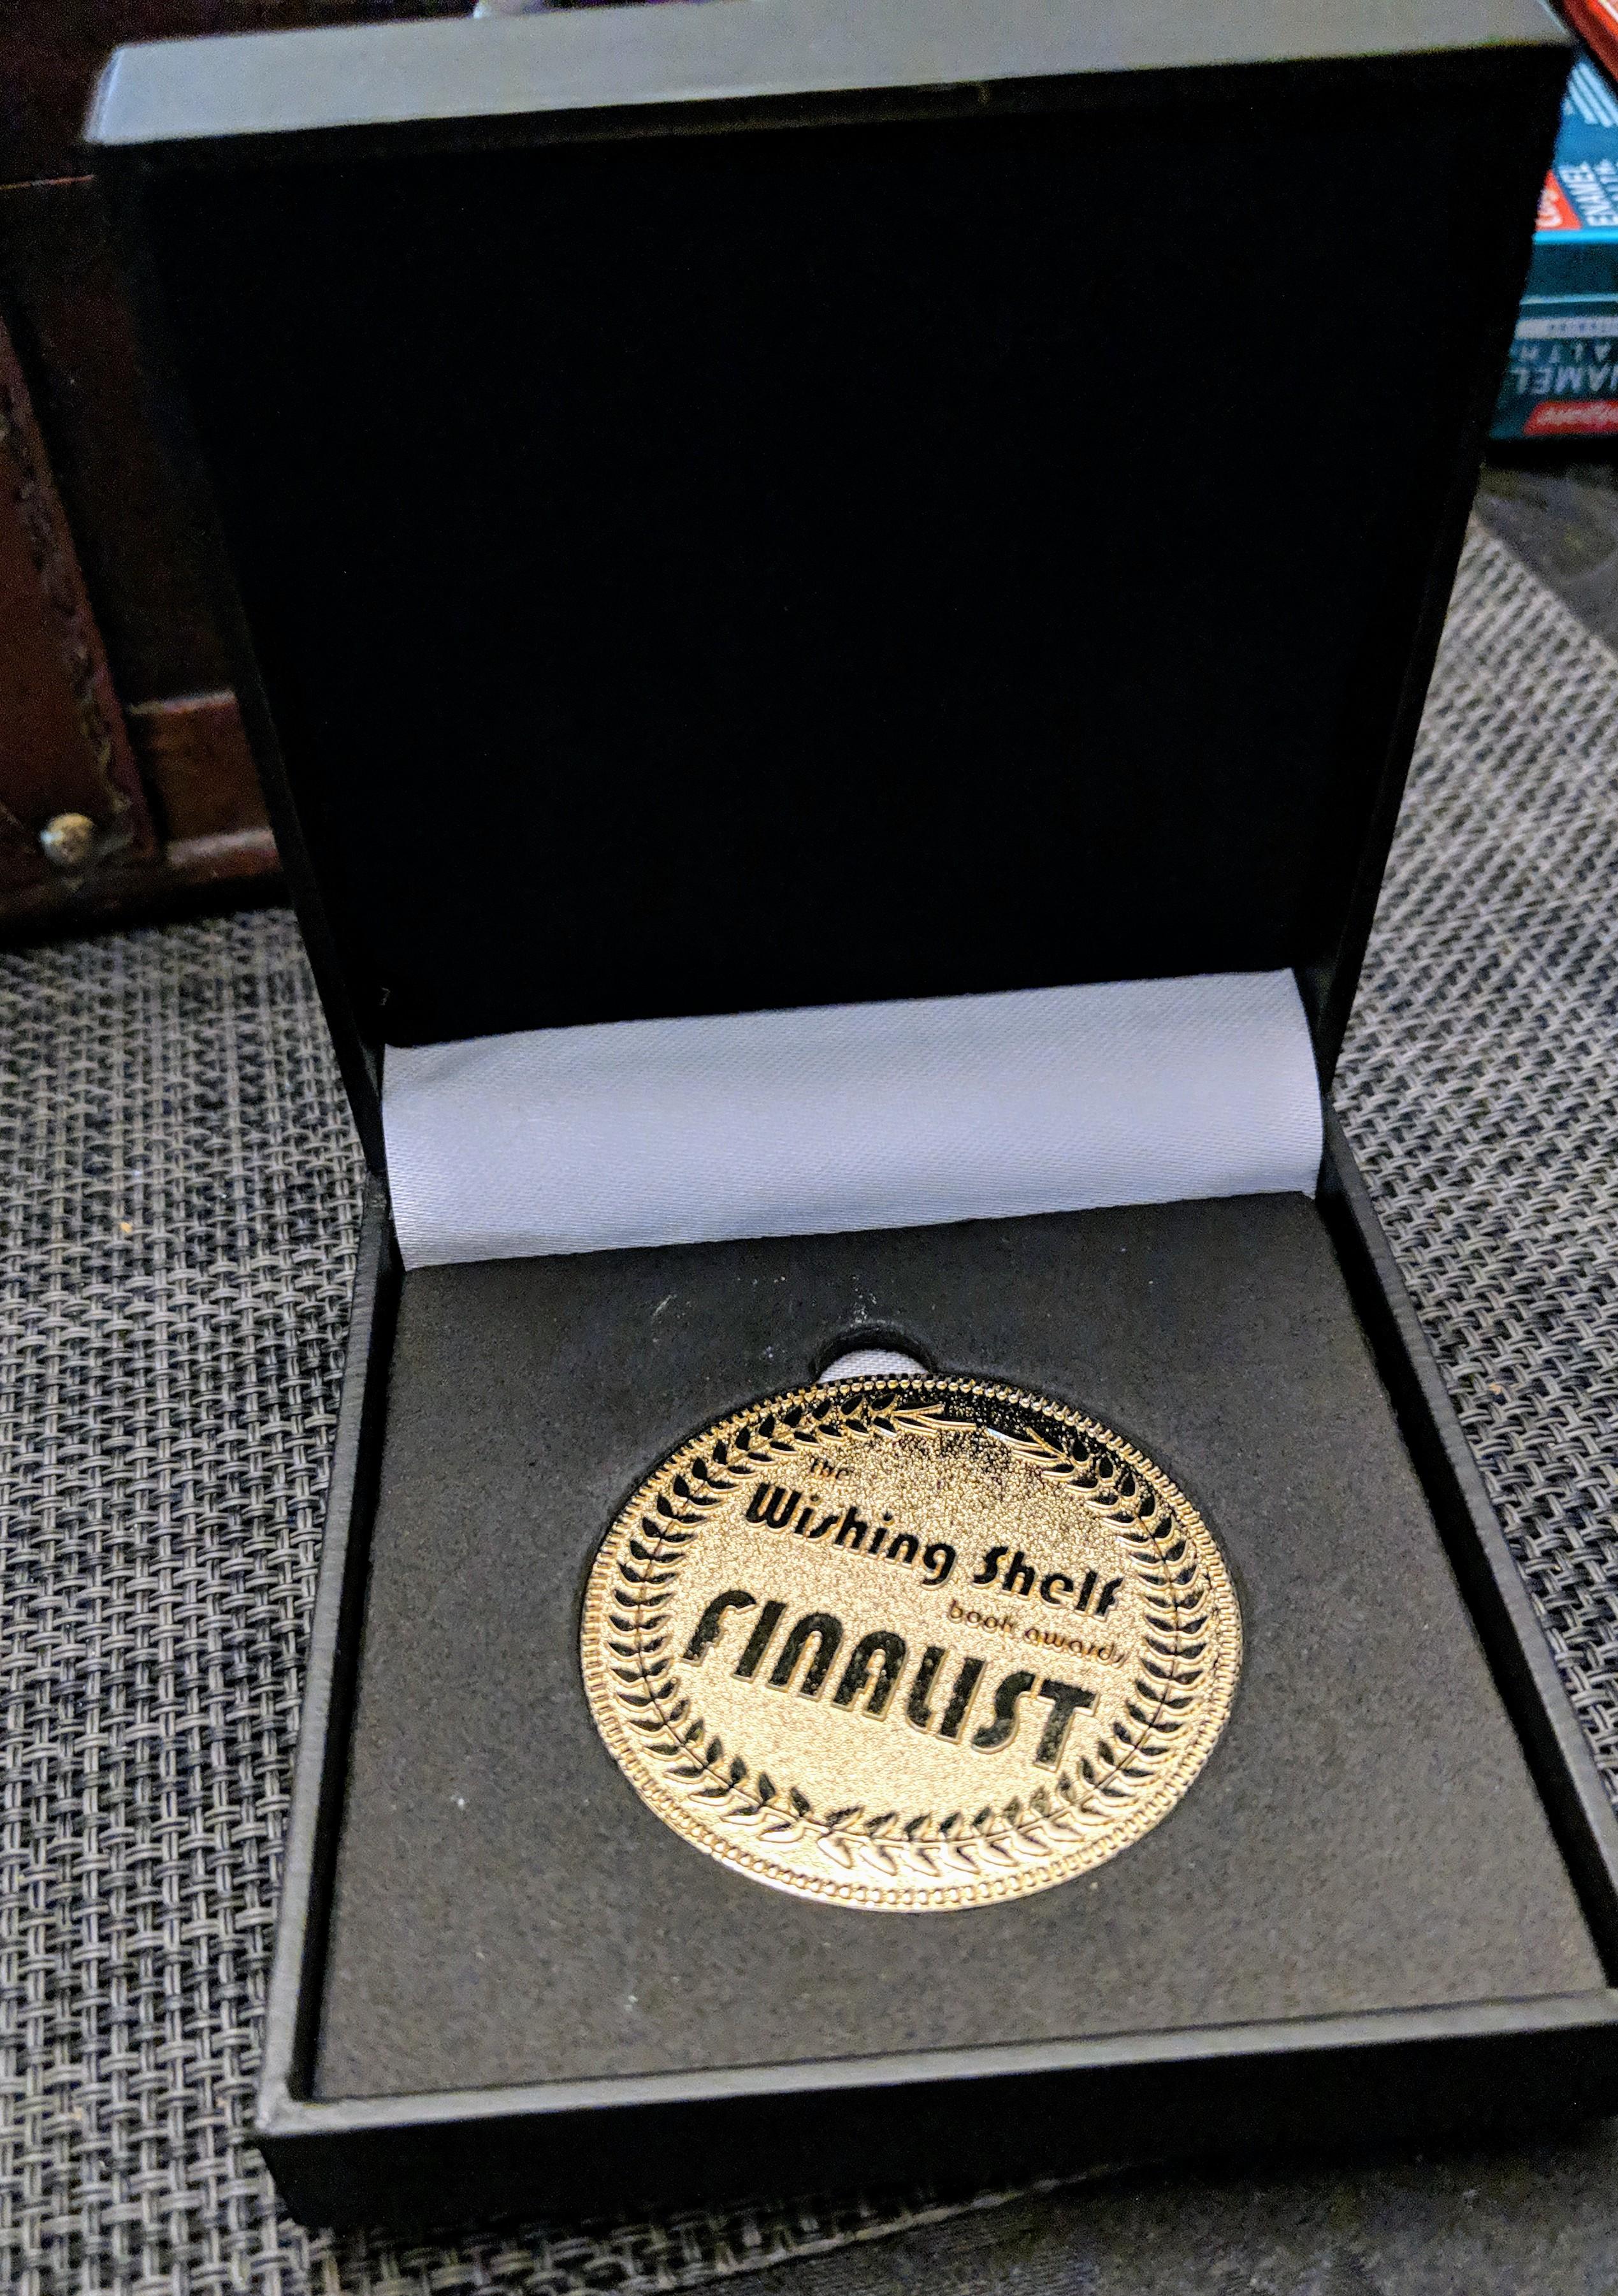 finalist medal